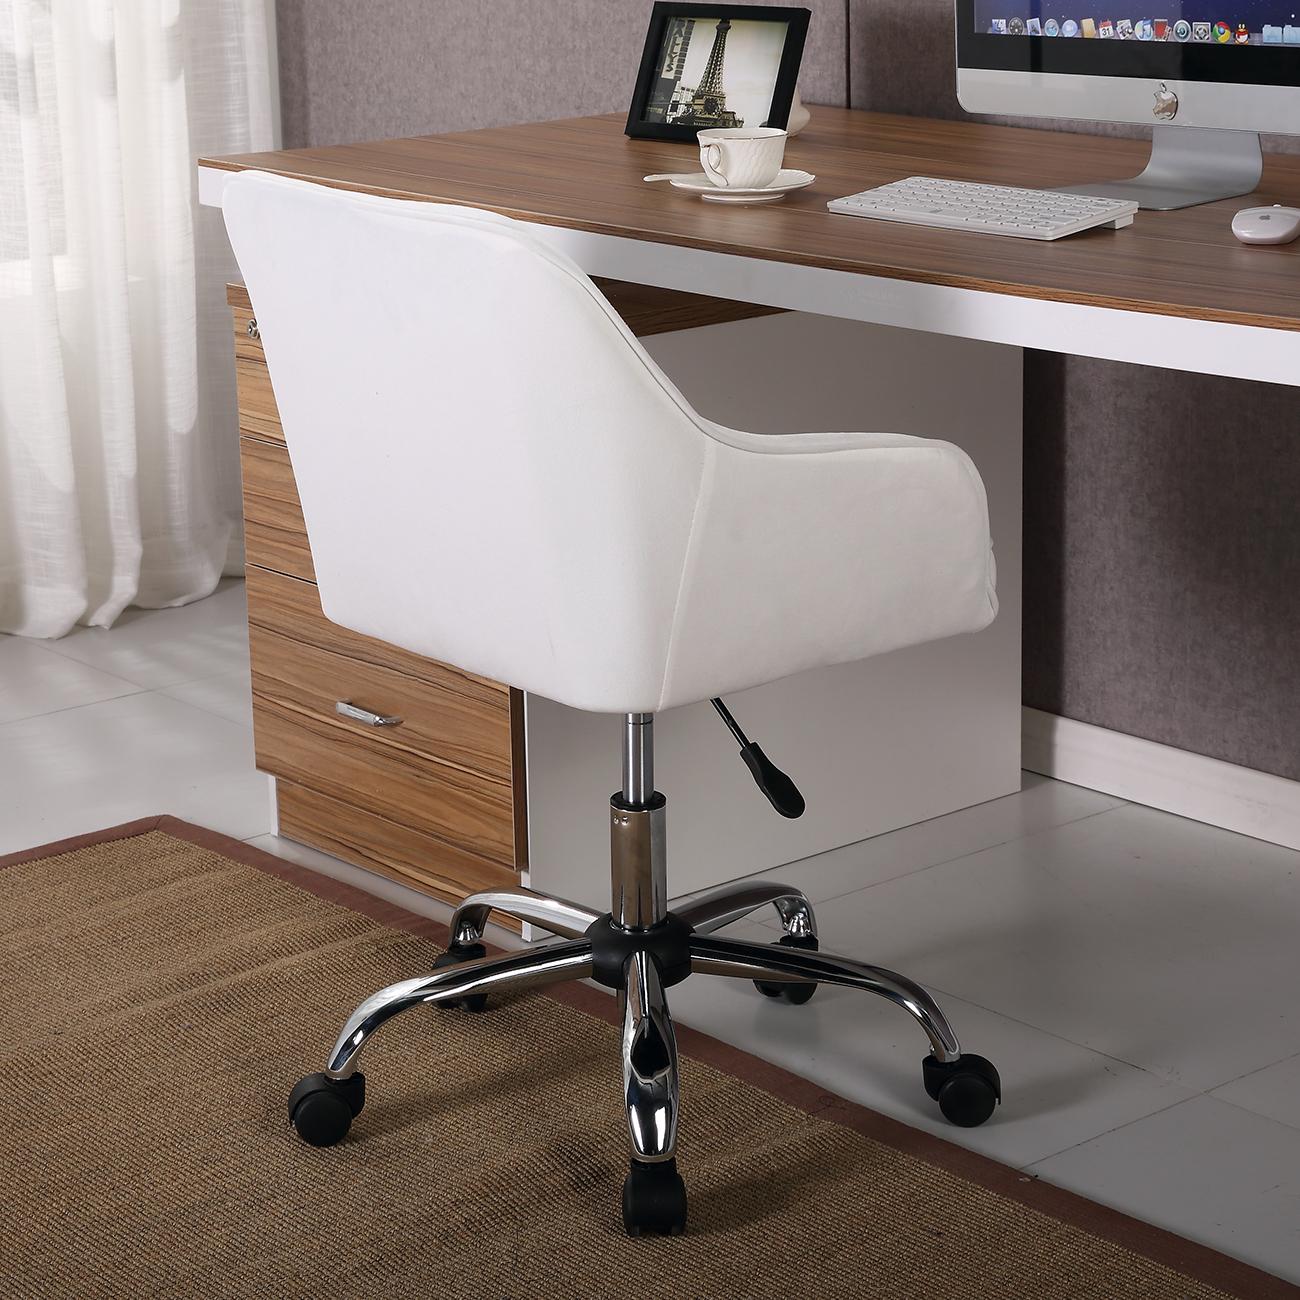 Modern Office Chair Task Desk Adjustable Swivel Height W